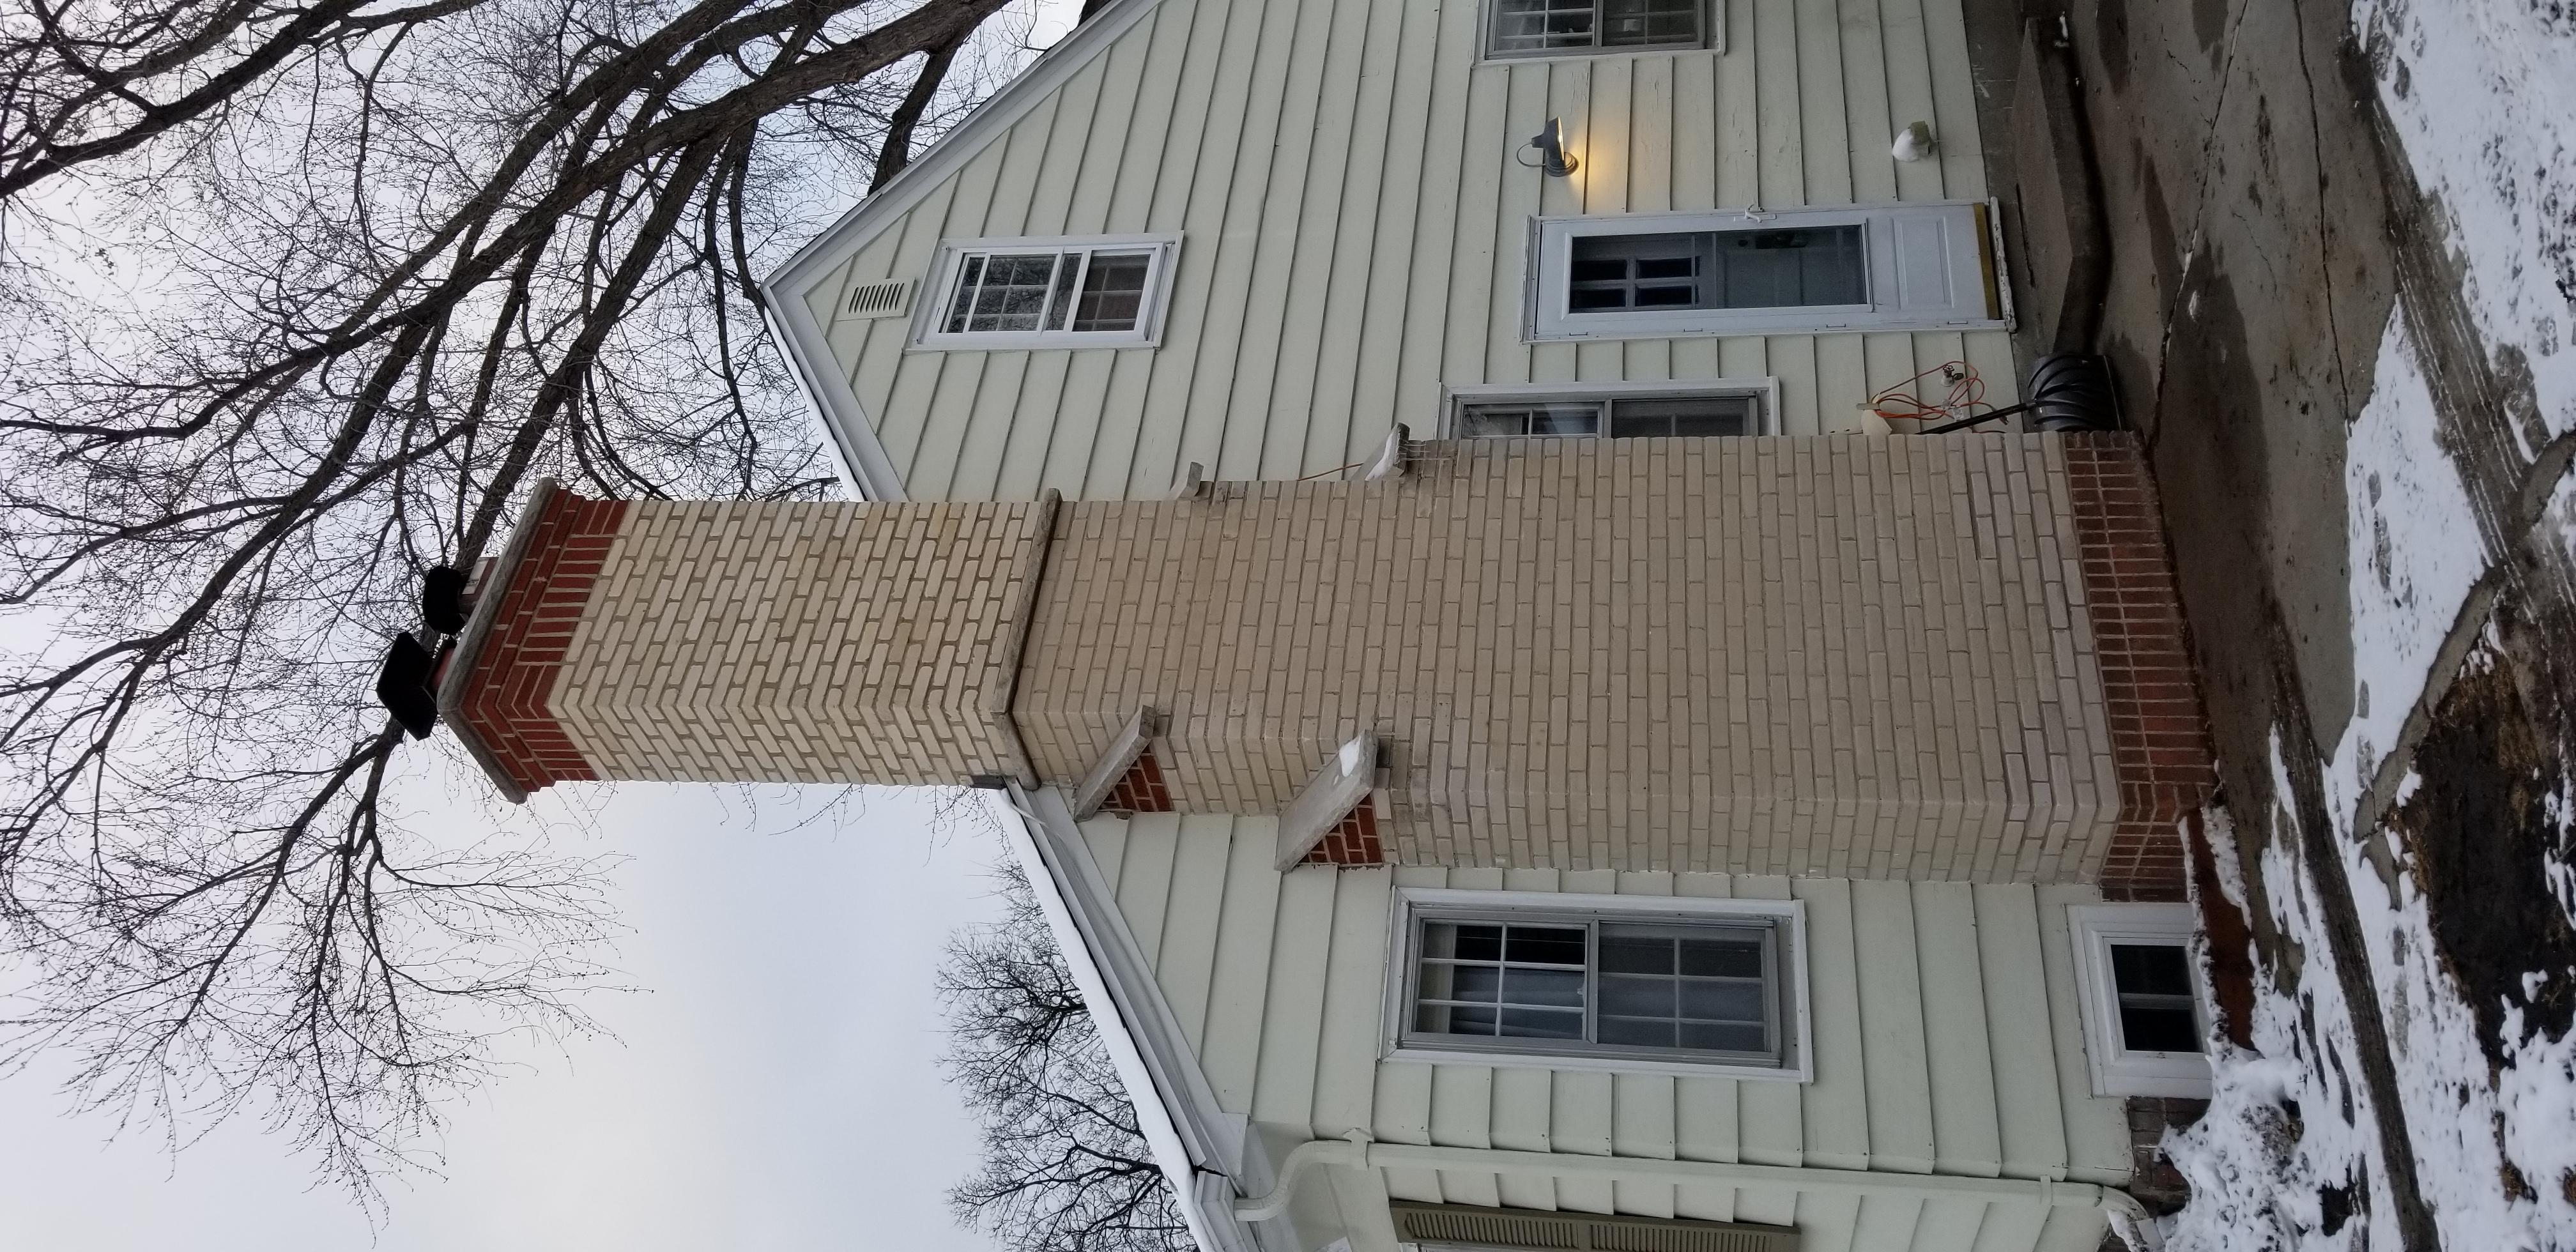 Brick Chimneys (42)